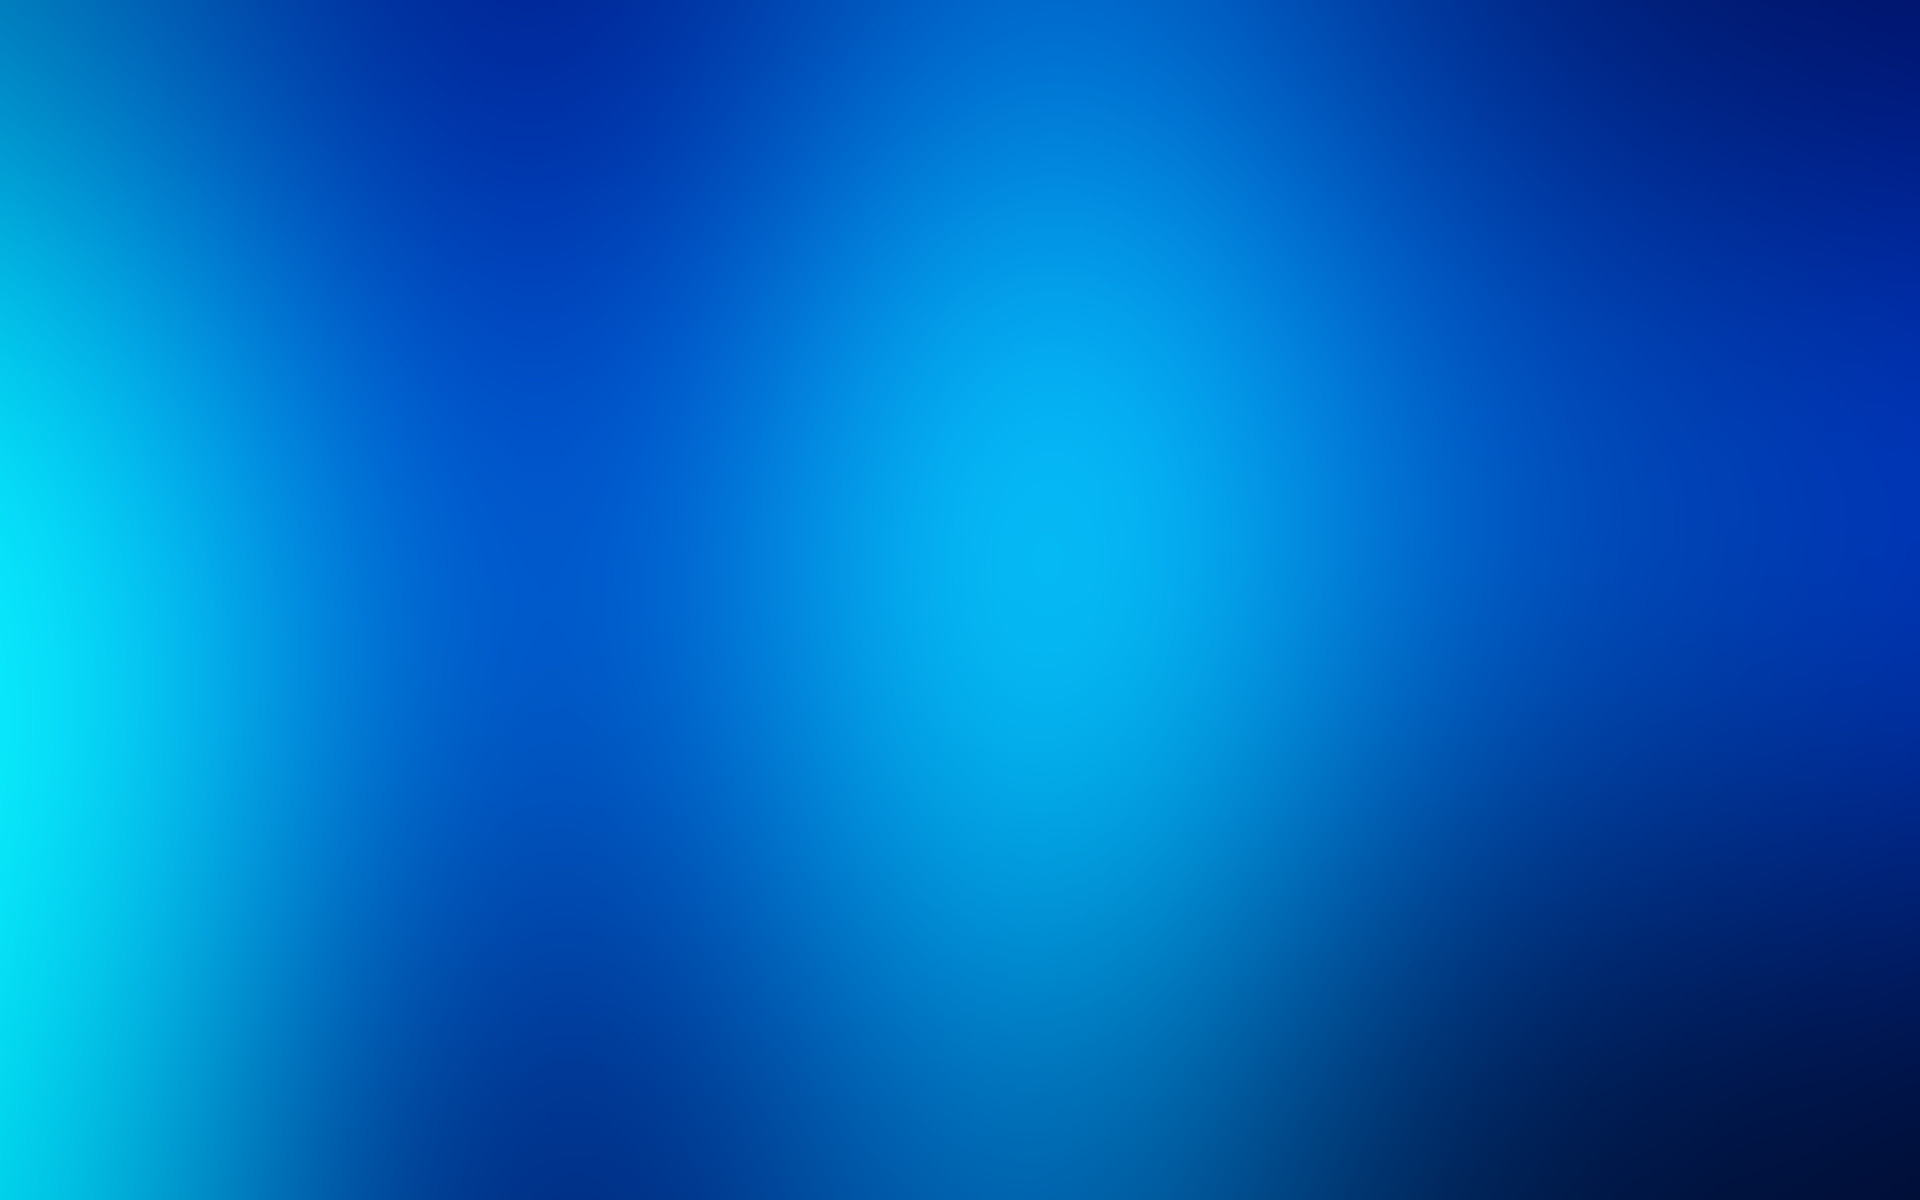 Blue Backgrounds Wallpaper Blue, Backgrounds, Gradient